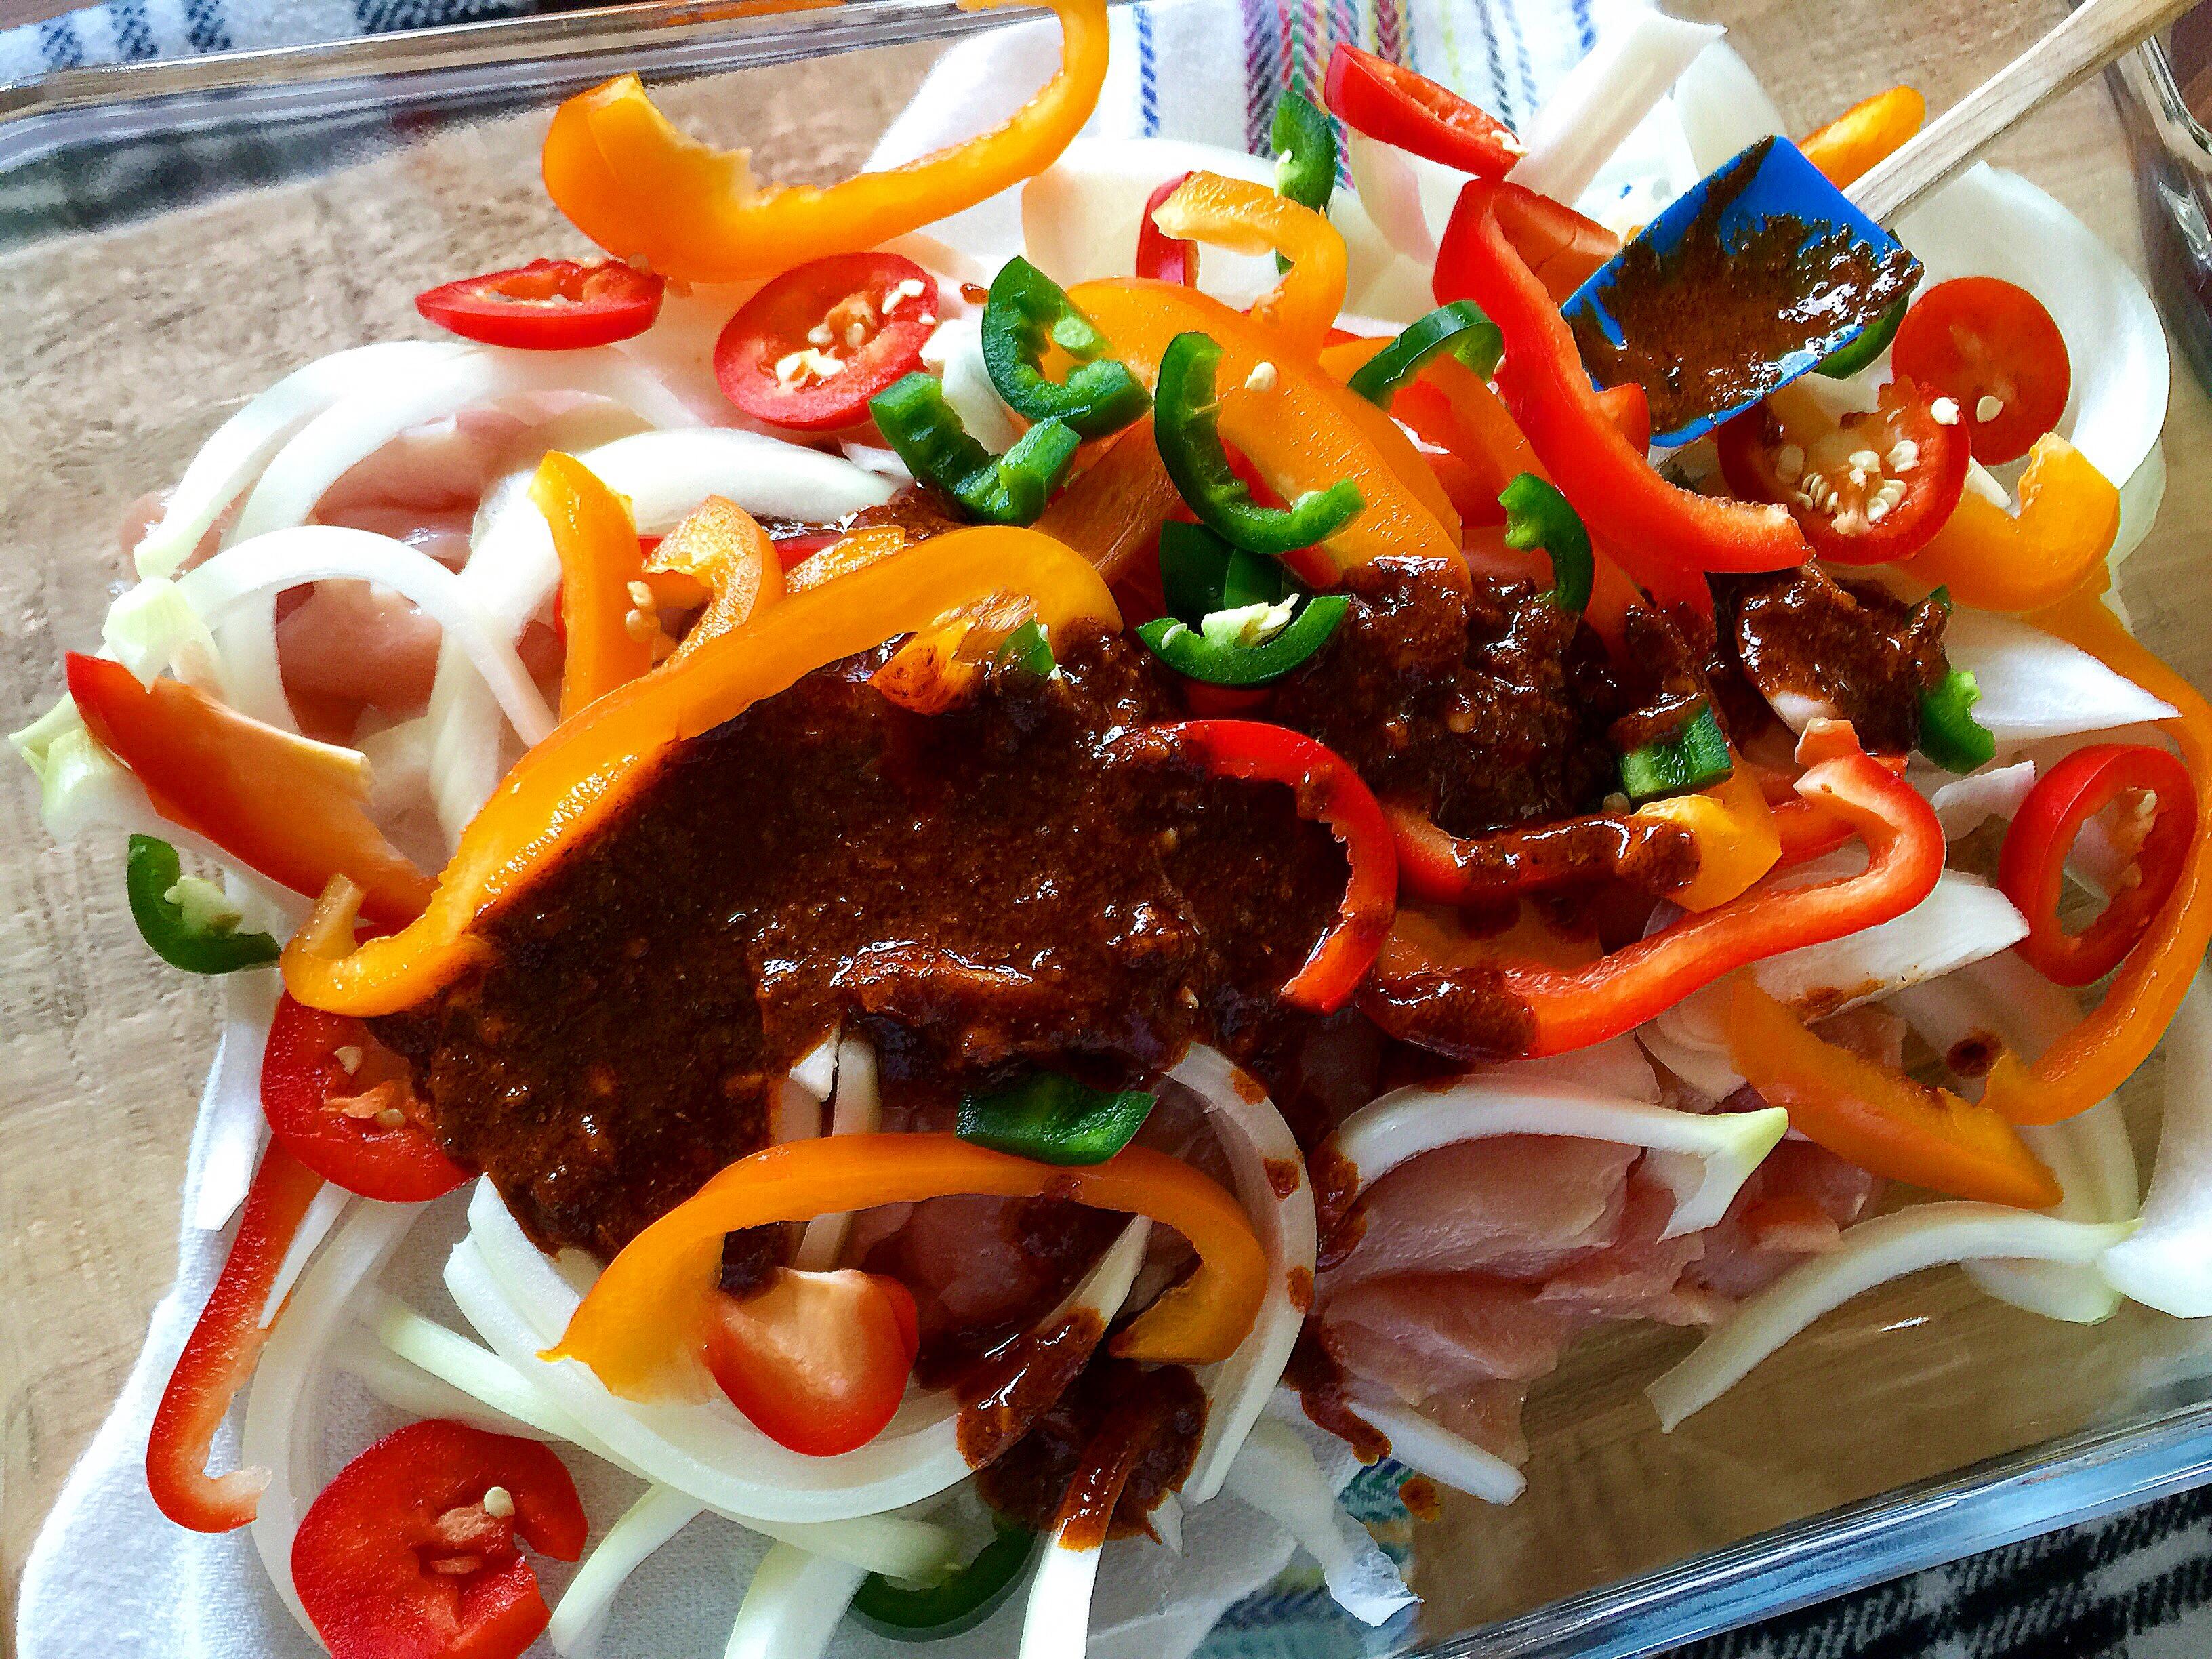 The EASIEST Homemade Chicken Fajitas — ((so tasty!))